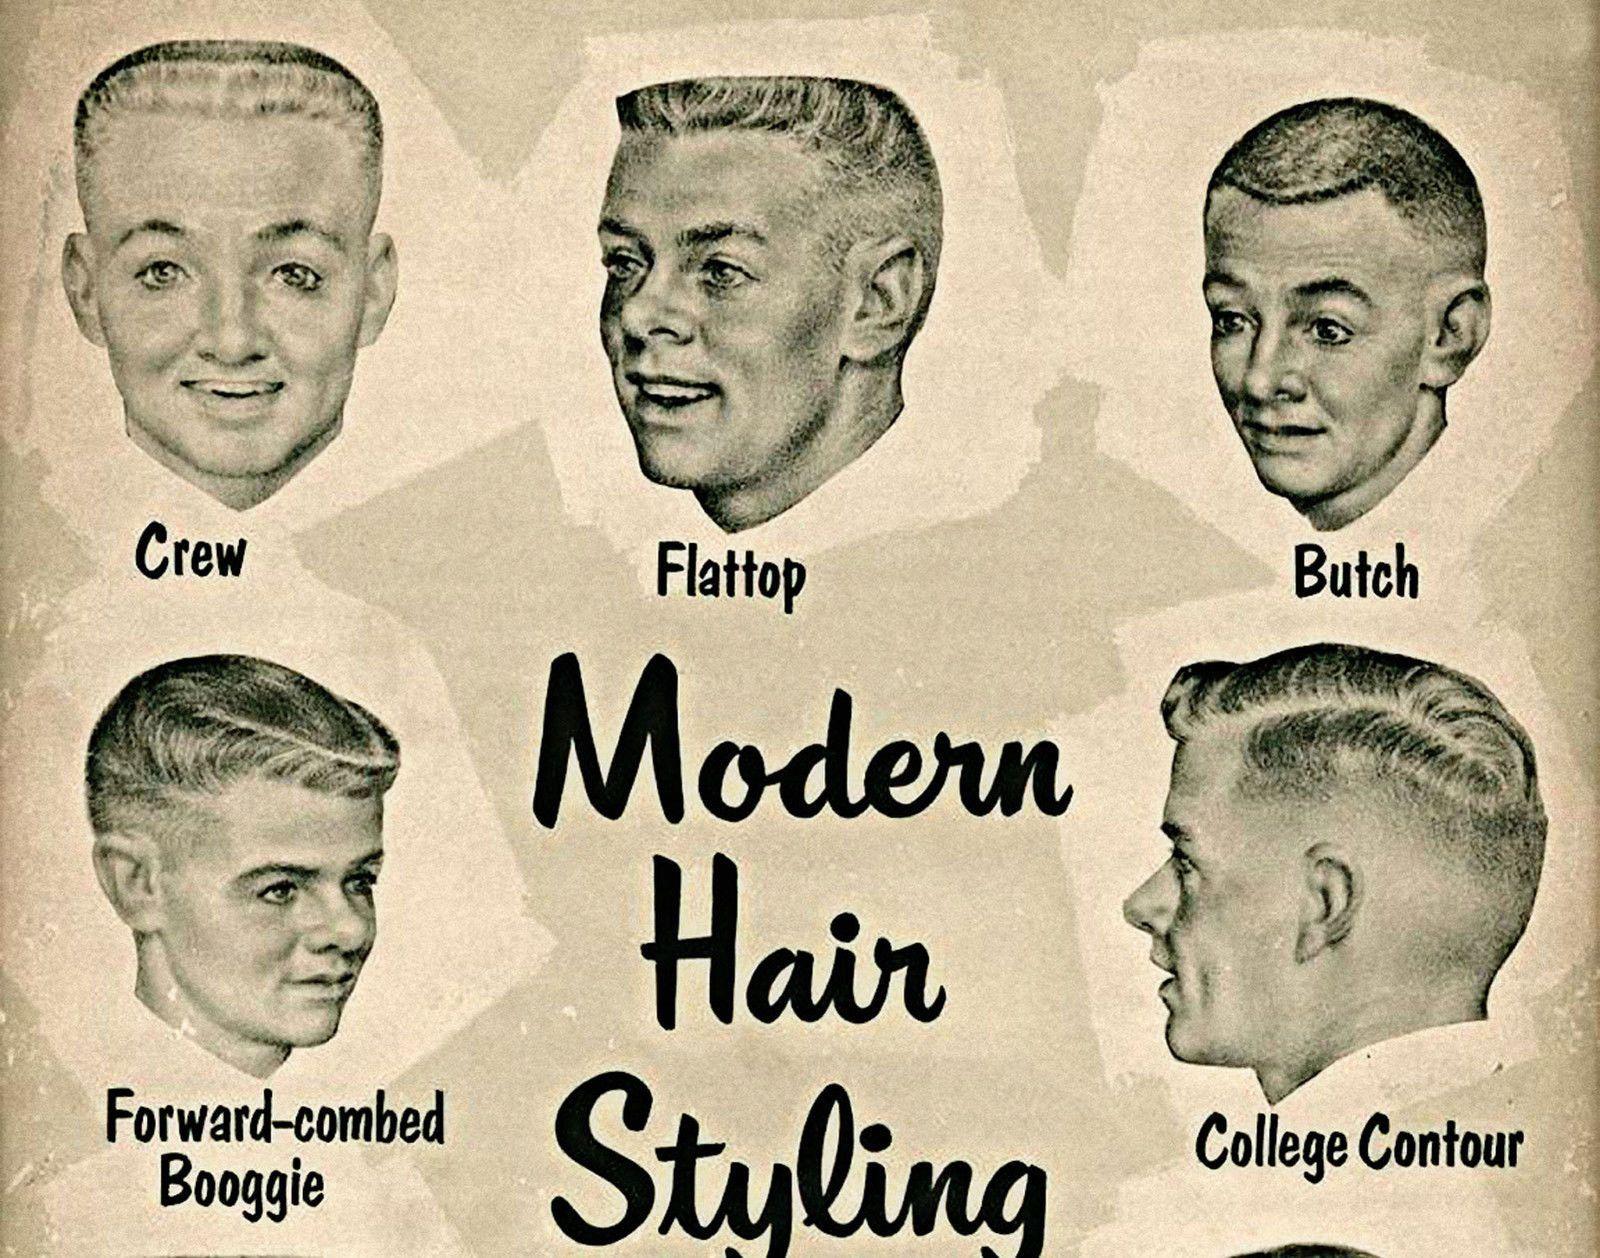 Hair Salon Design Photos Modern Hair Salon Design Photos Beauty Salon Decor Salon Interior Design Hair Salon Design